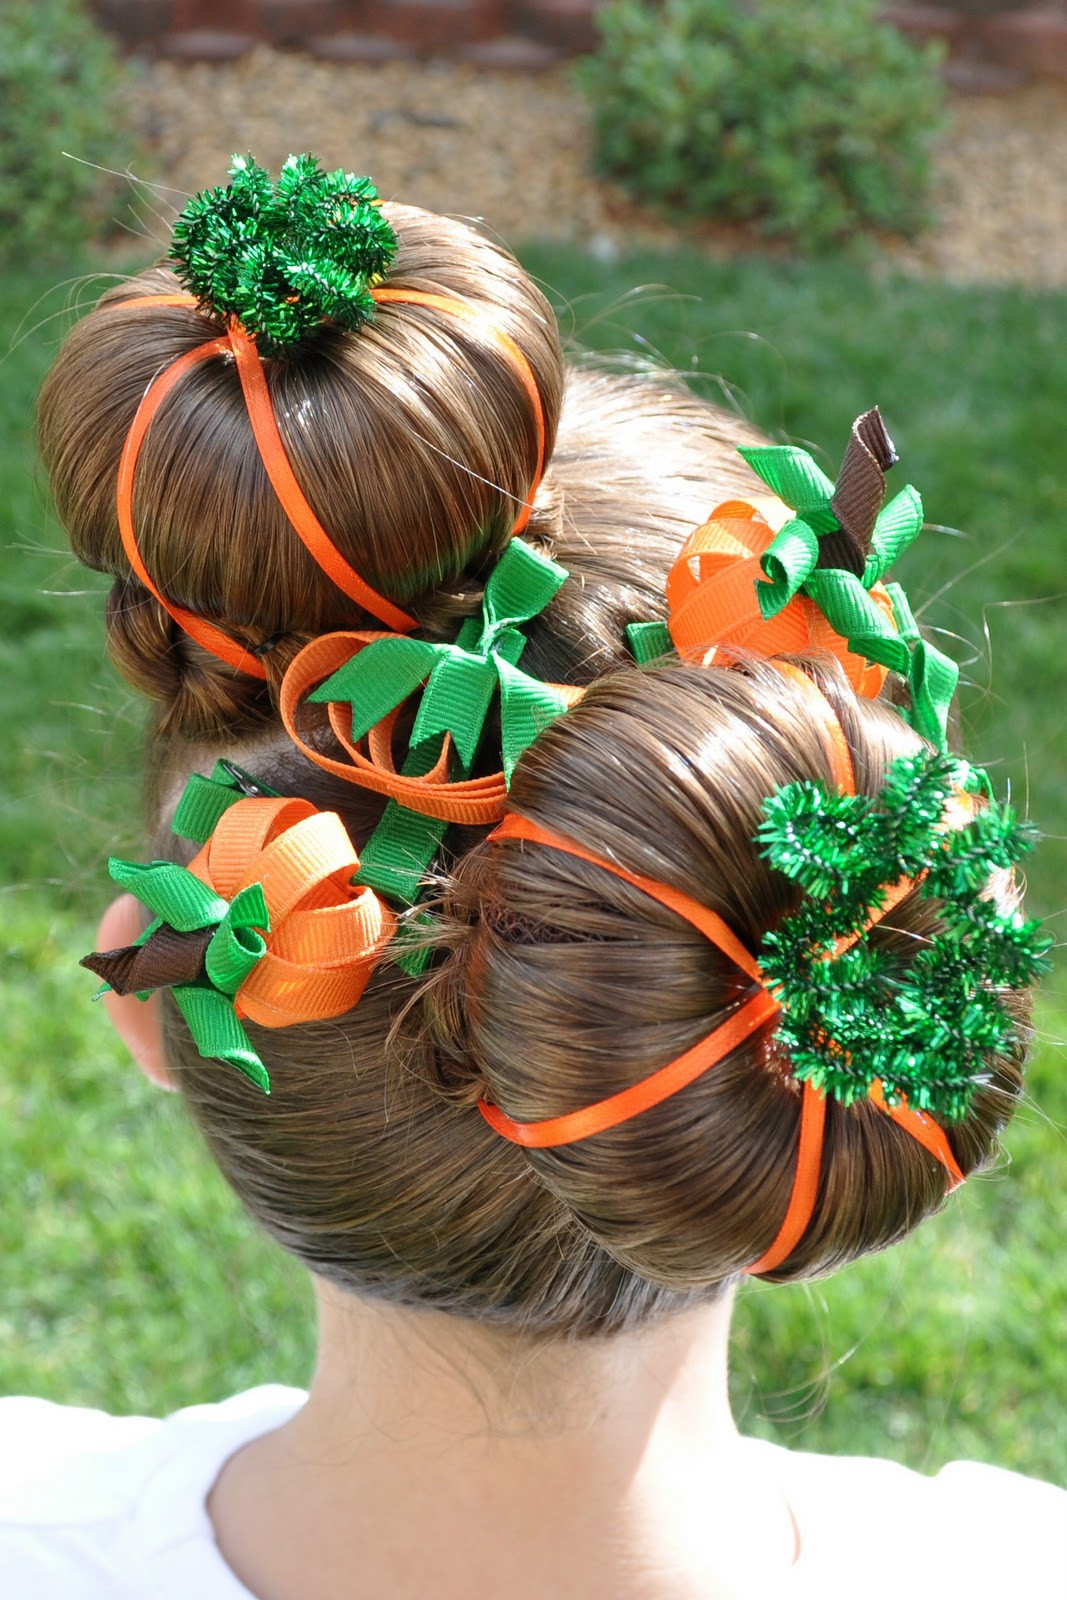 Best ideas about Cute Halloween Hairstyles . Save or Pin Princess Piggies Halloween Hairdos Pumpkin Patch Now.